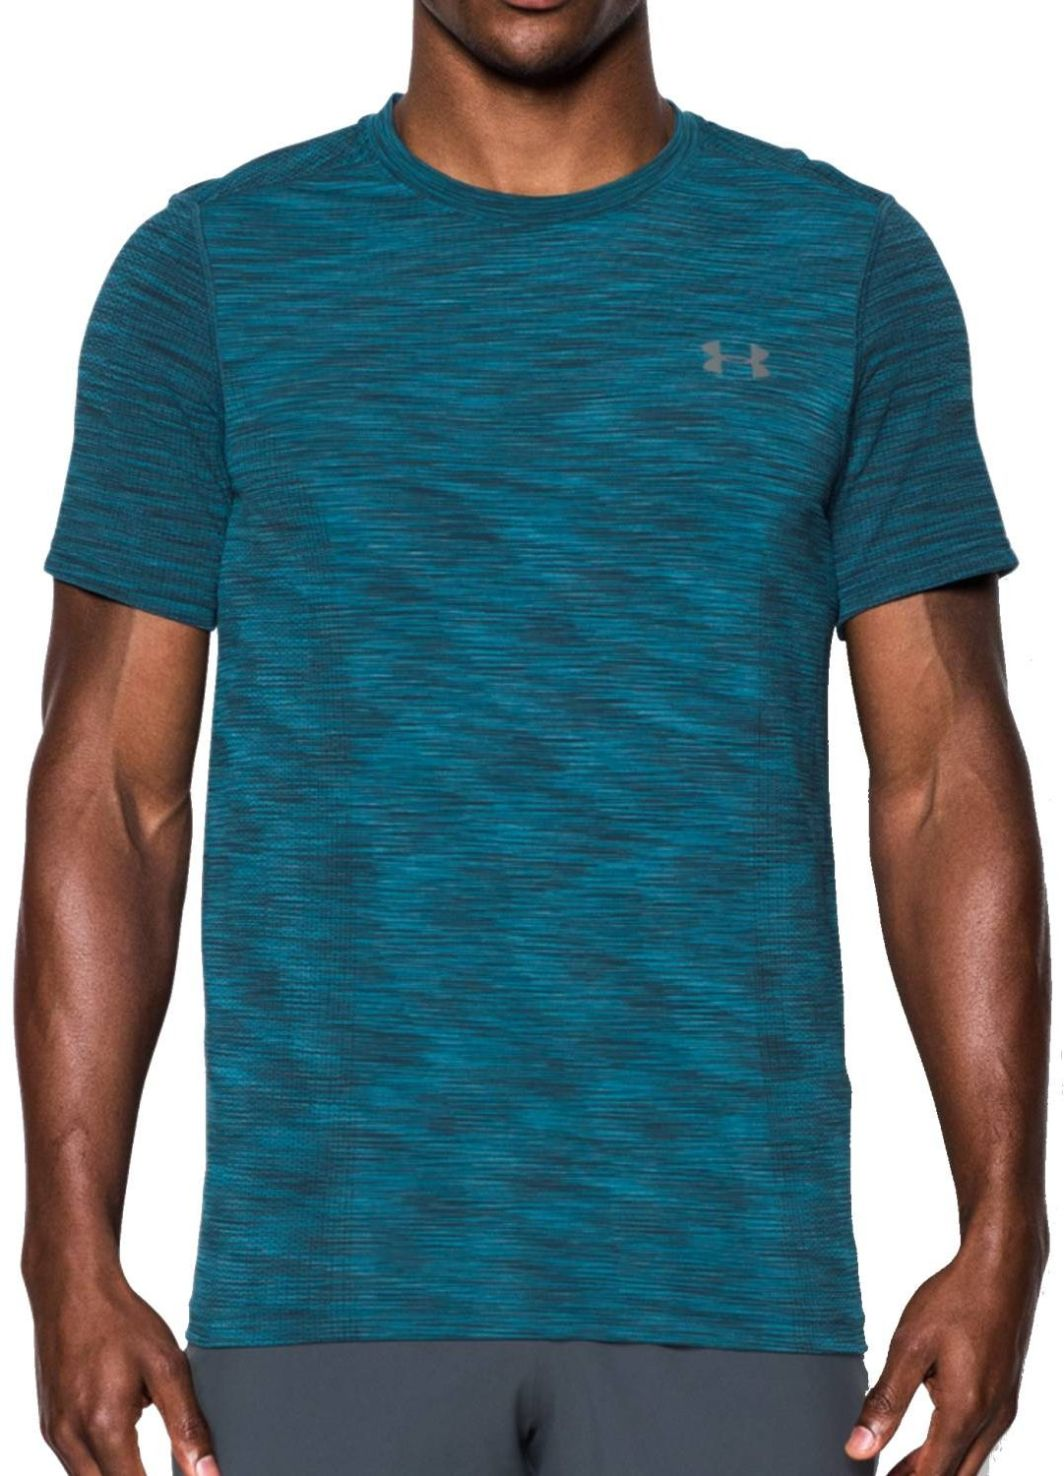 Under Armour Men Threadborne Seamless Short Sleeve T-Shirt